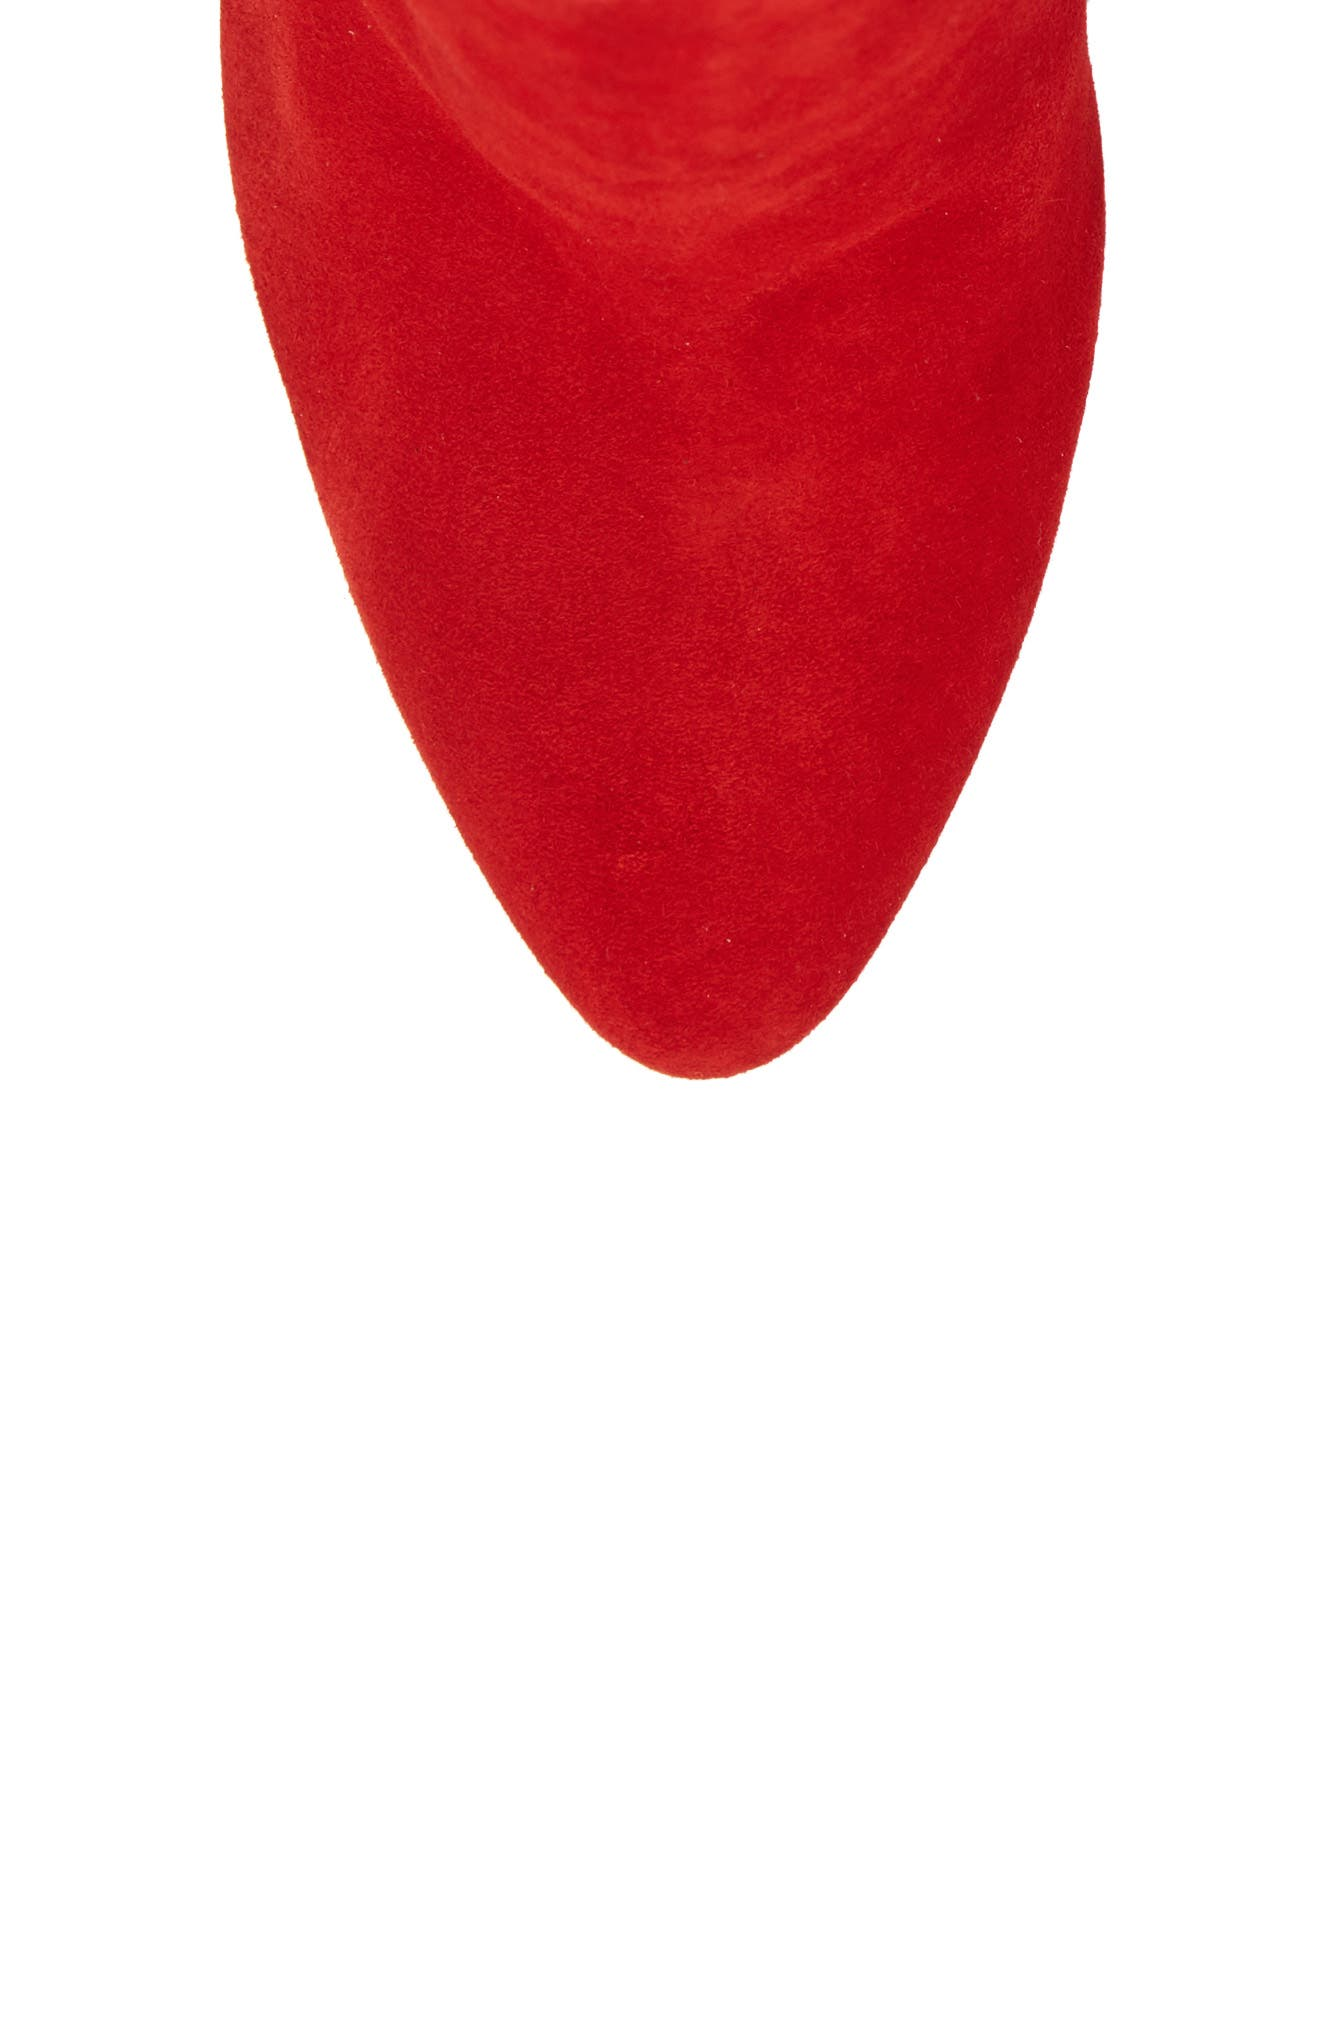 Eloise Almond Toe Bootie,                             Alternate thumbnail 5, color,                             LOUBI RED